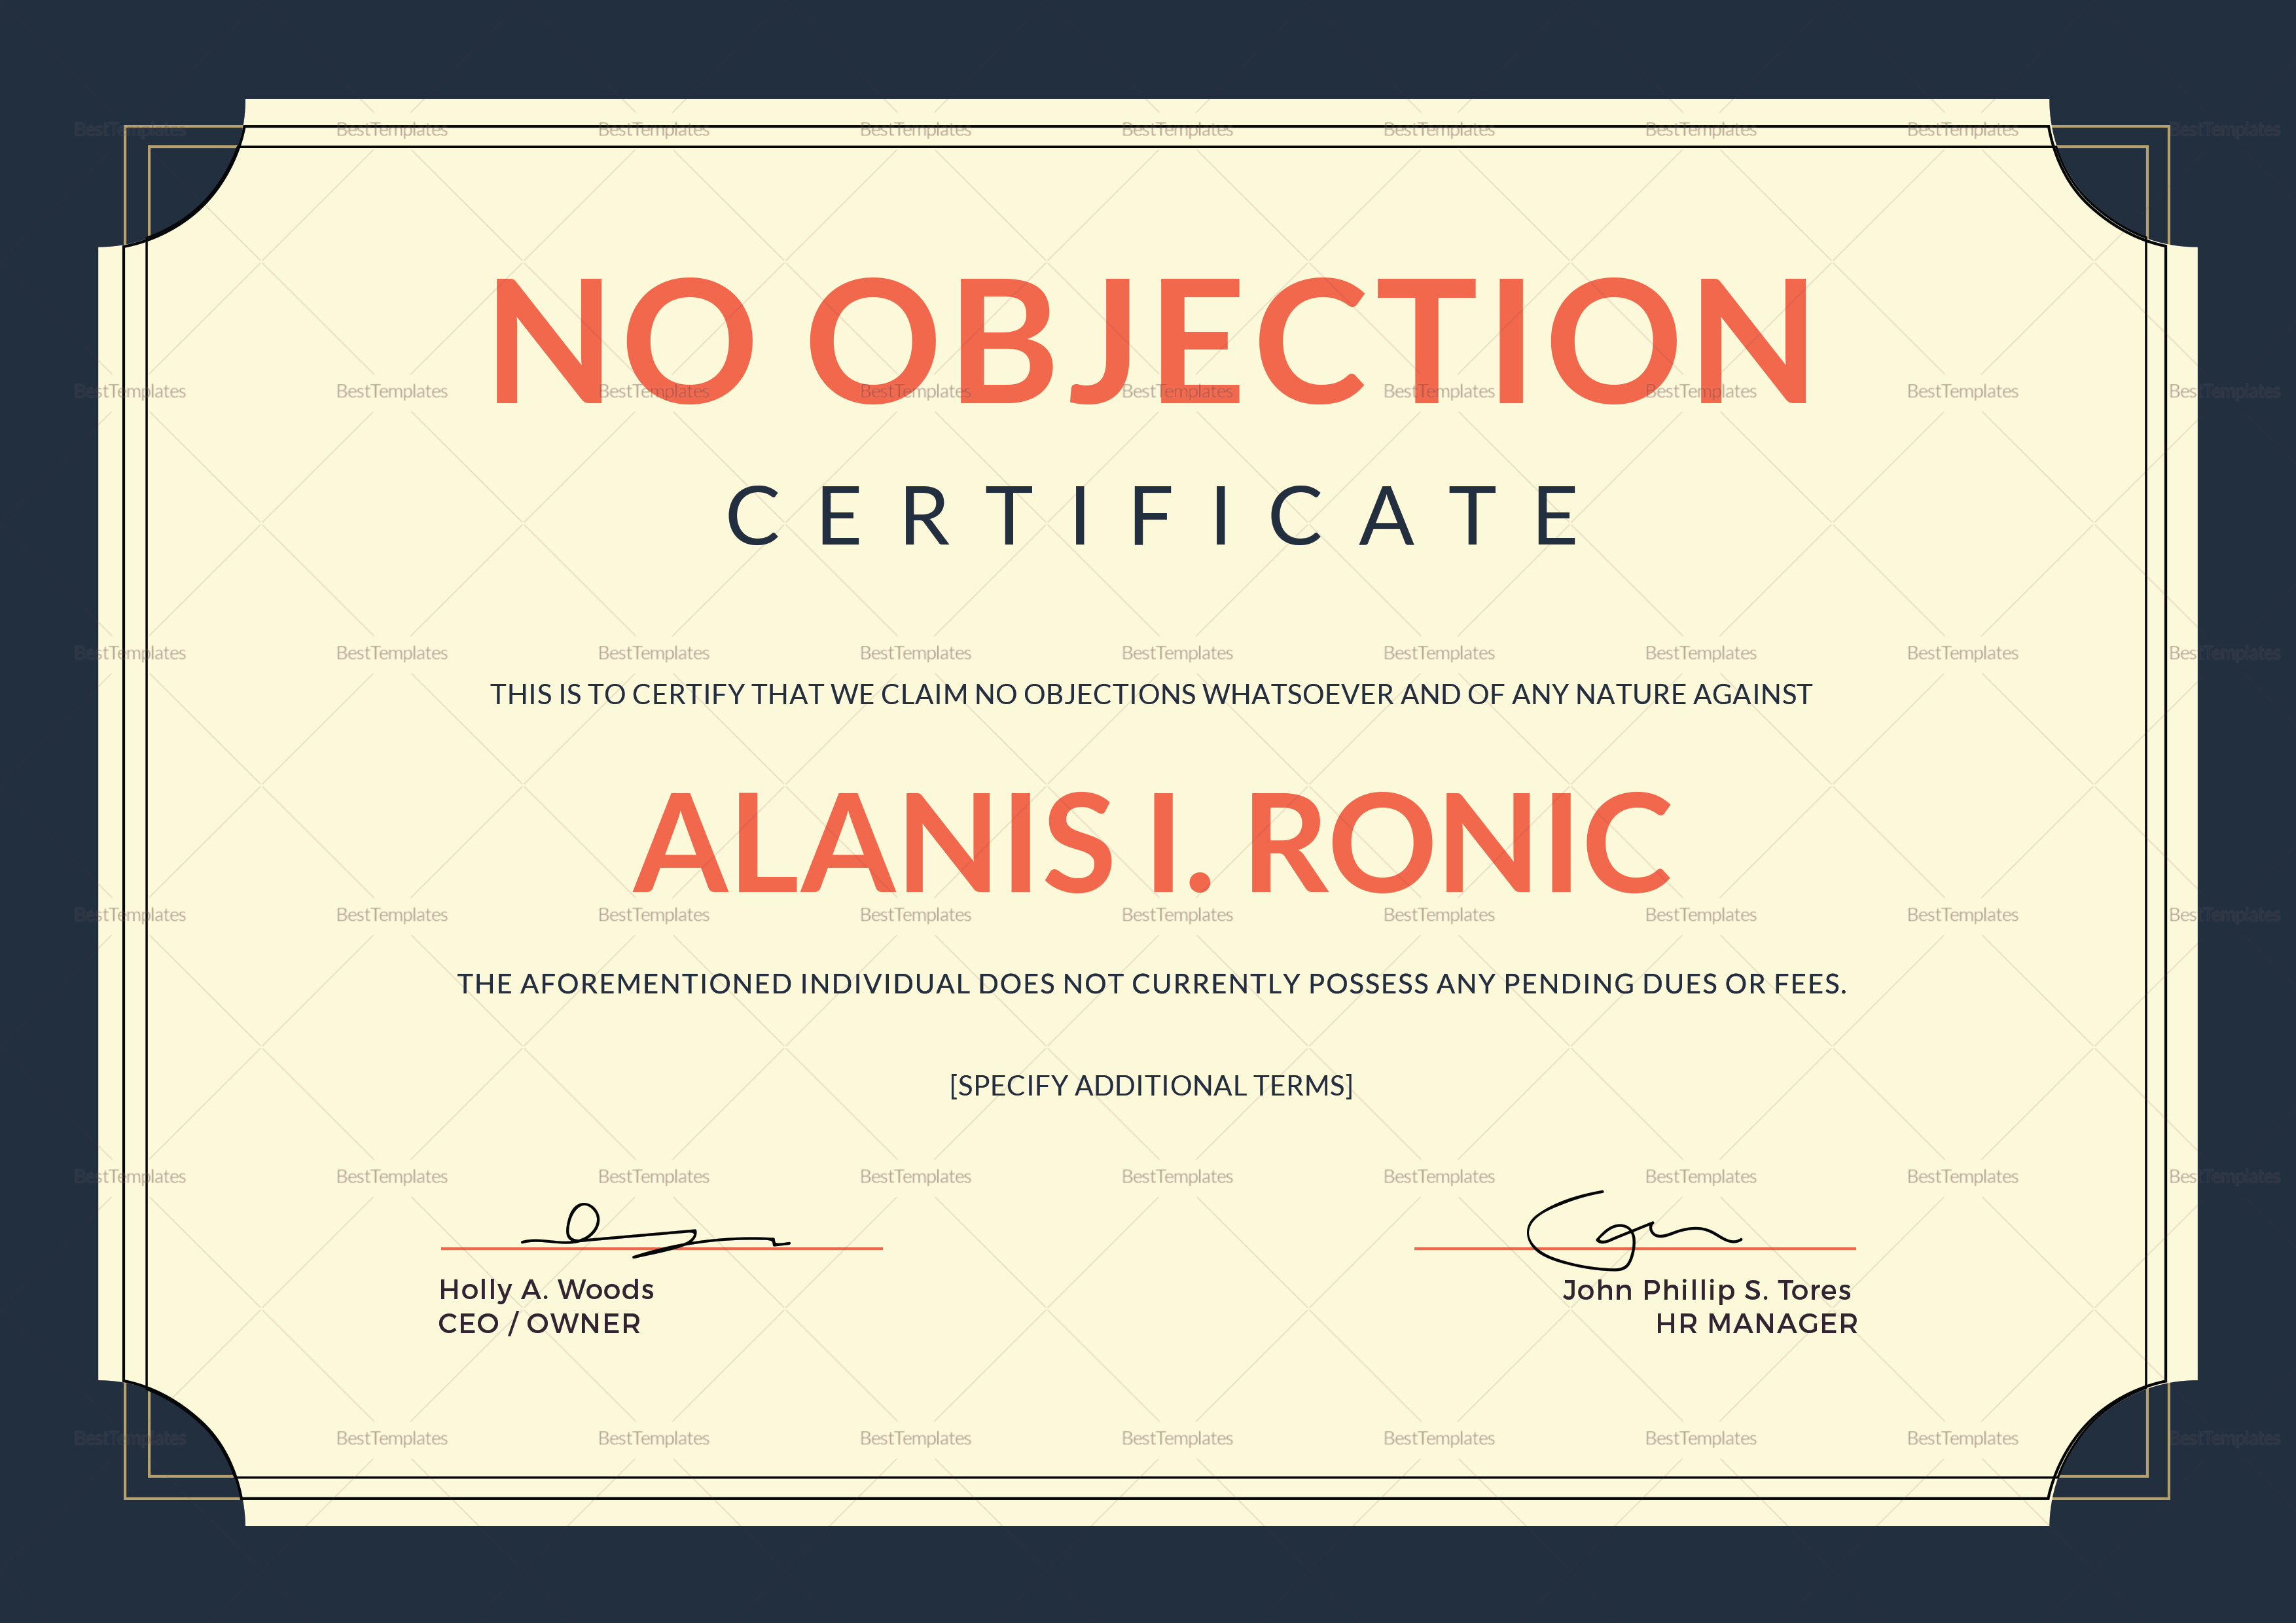 Employee No Objection Certificate